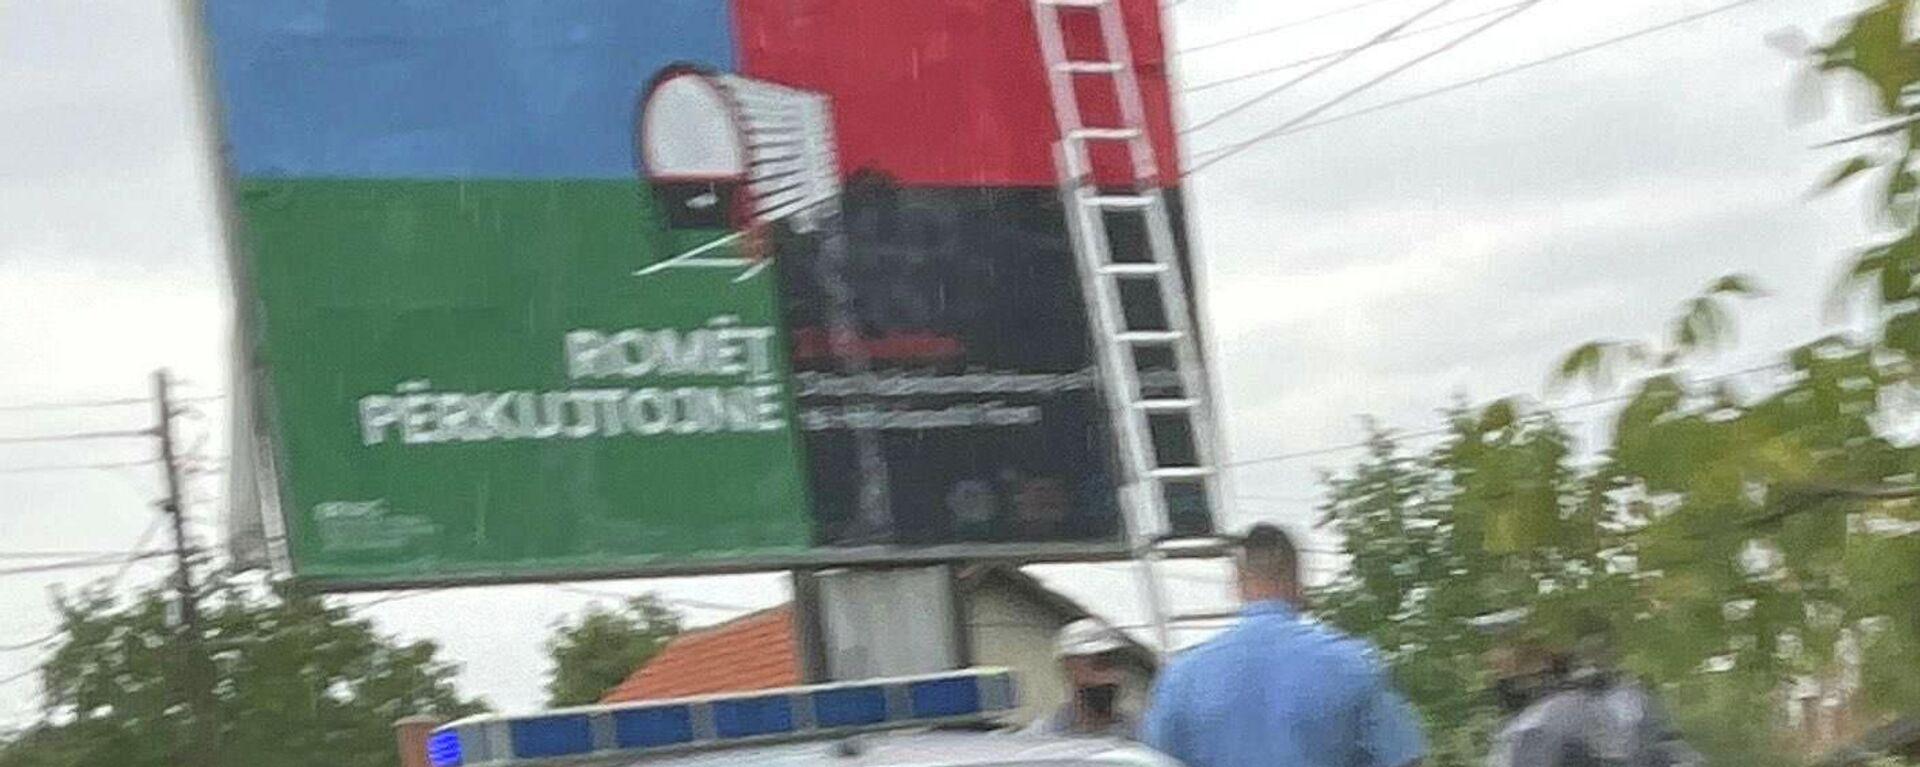 Грачаница билборд - Sputnik Србија, 1920, 22.09.2021